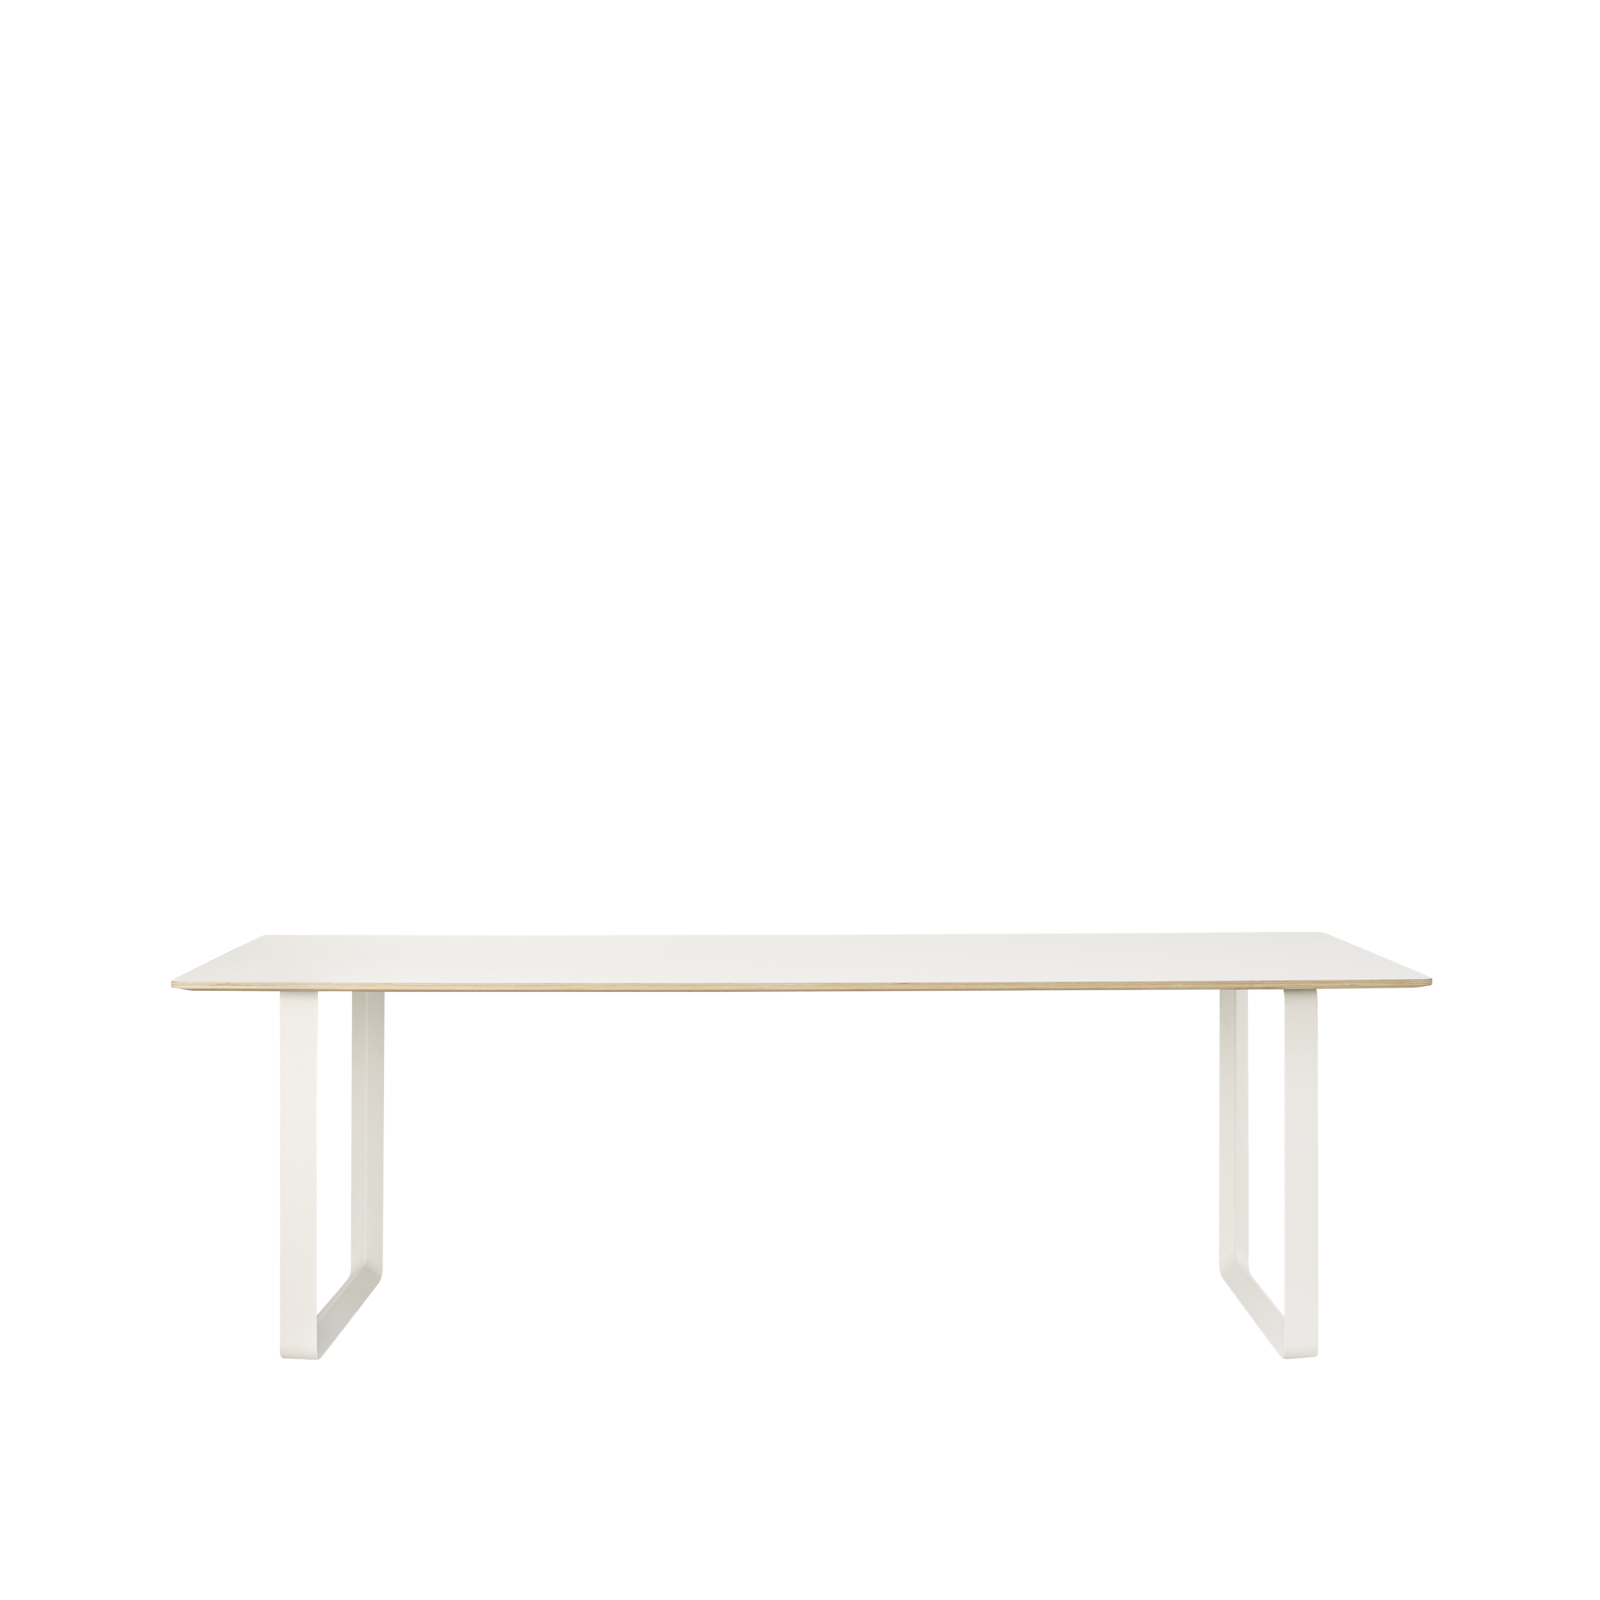 70/70 Table Extra Large White/White